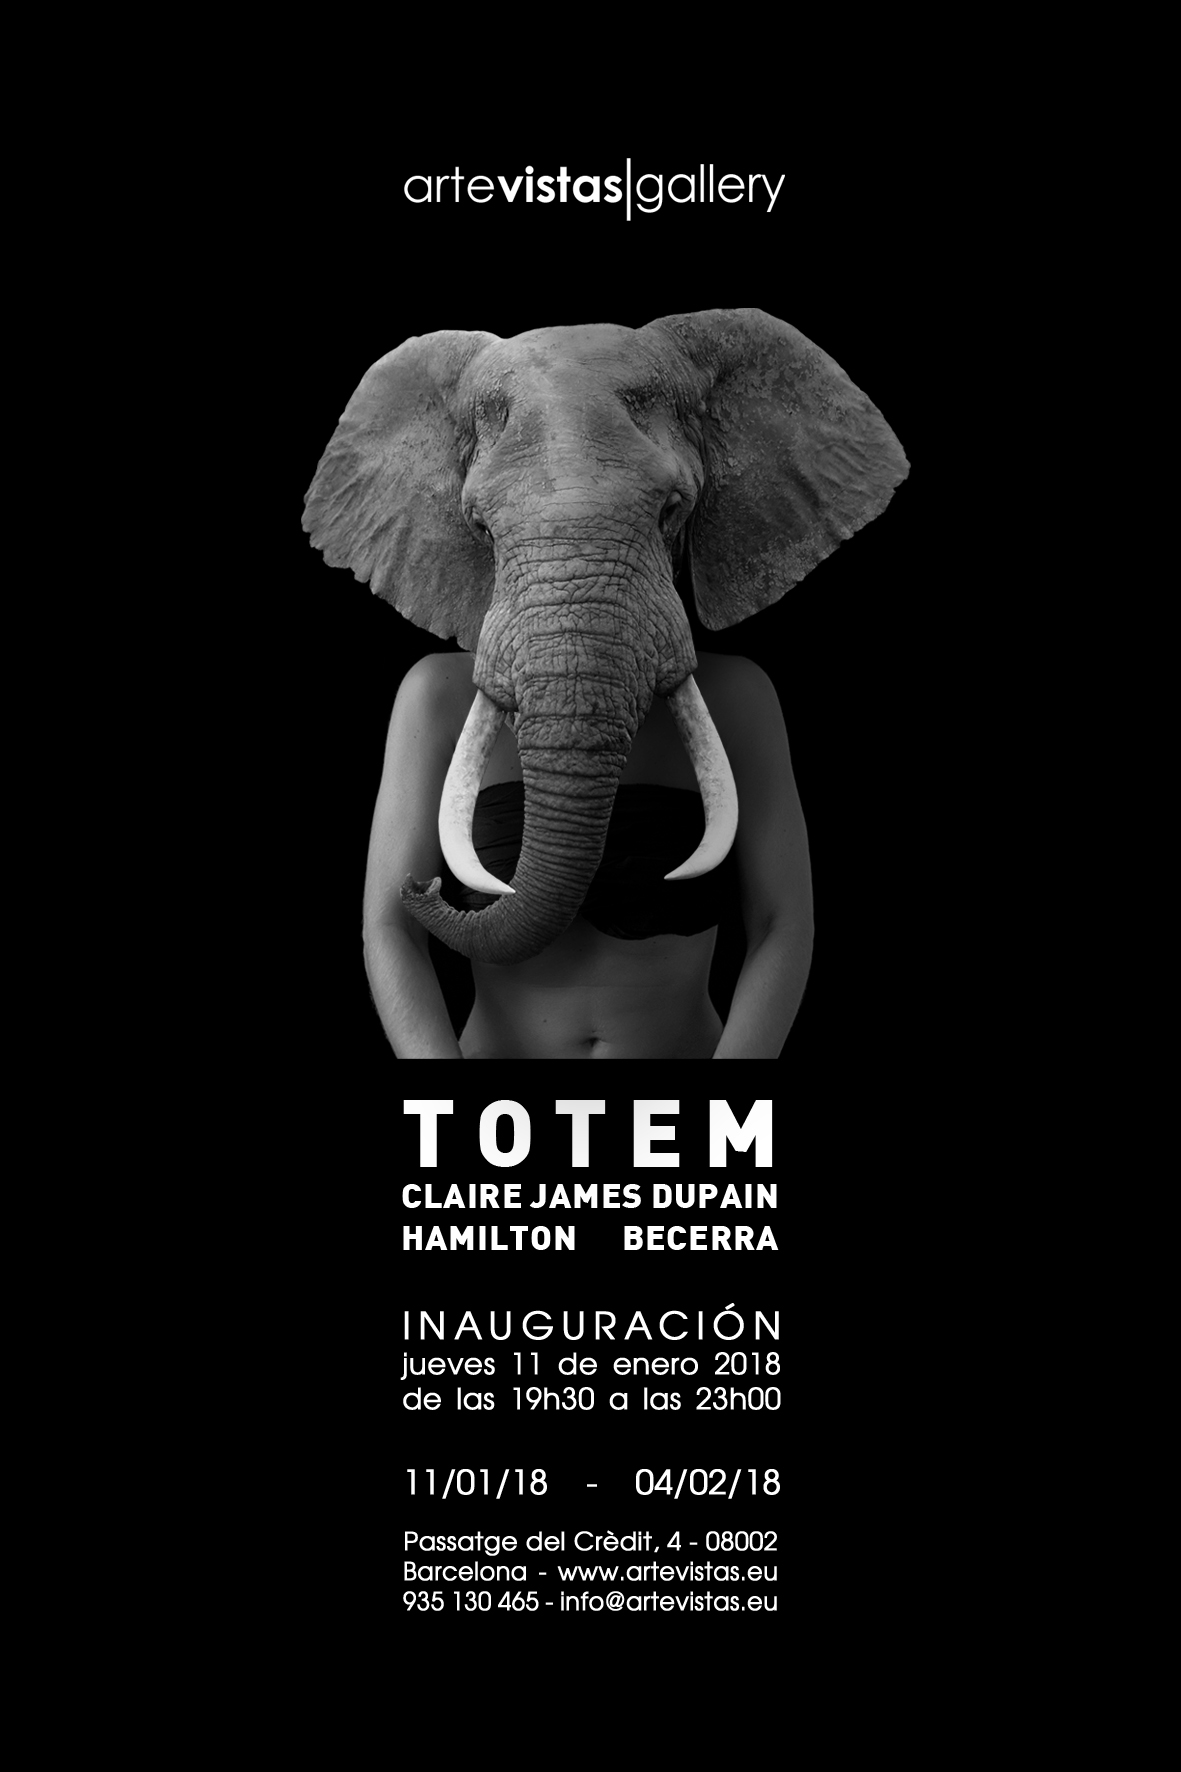 Totem - Hamilton Becerra & Claire James Dupain